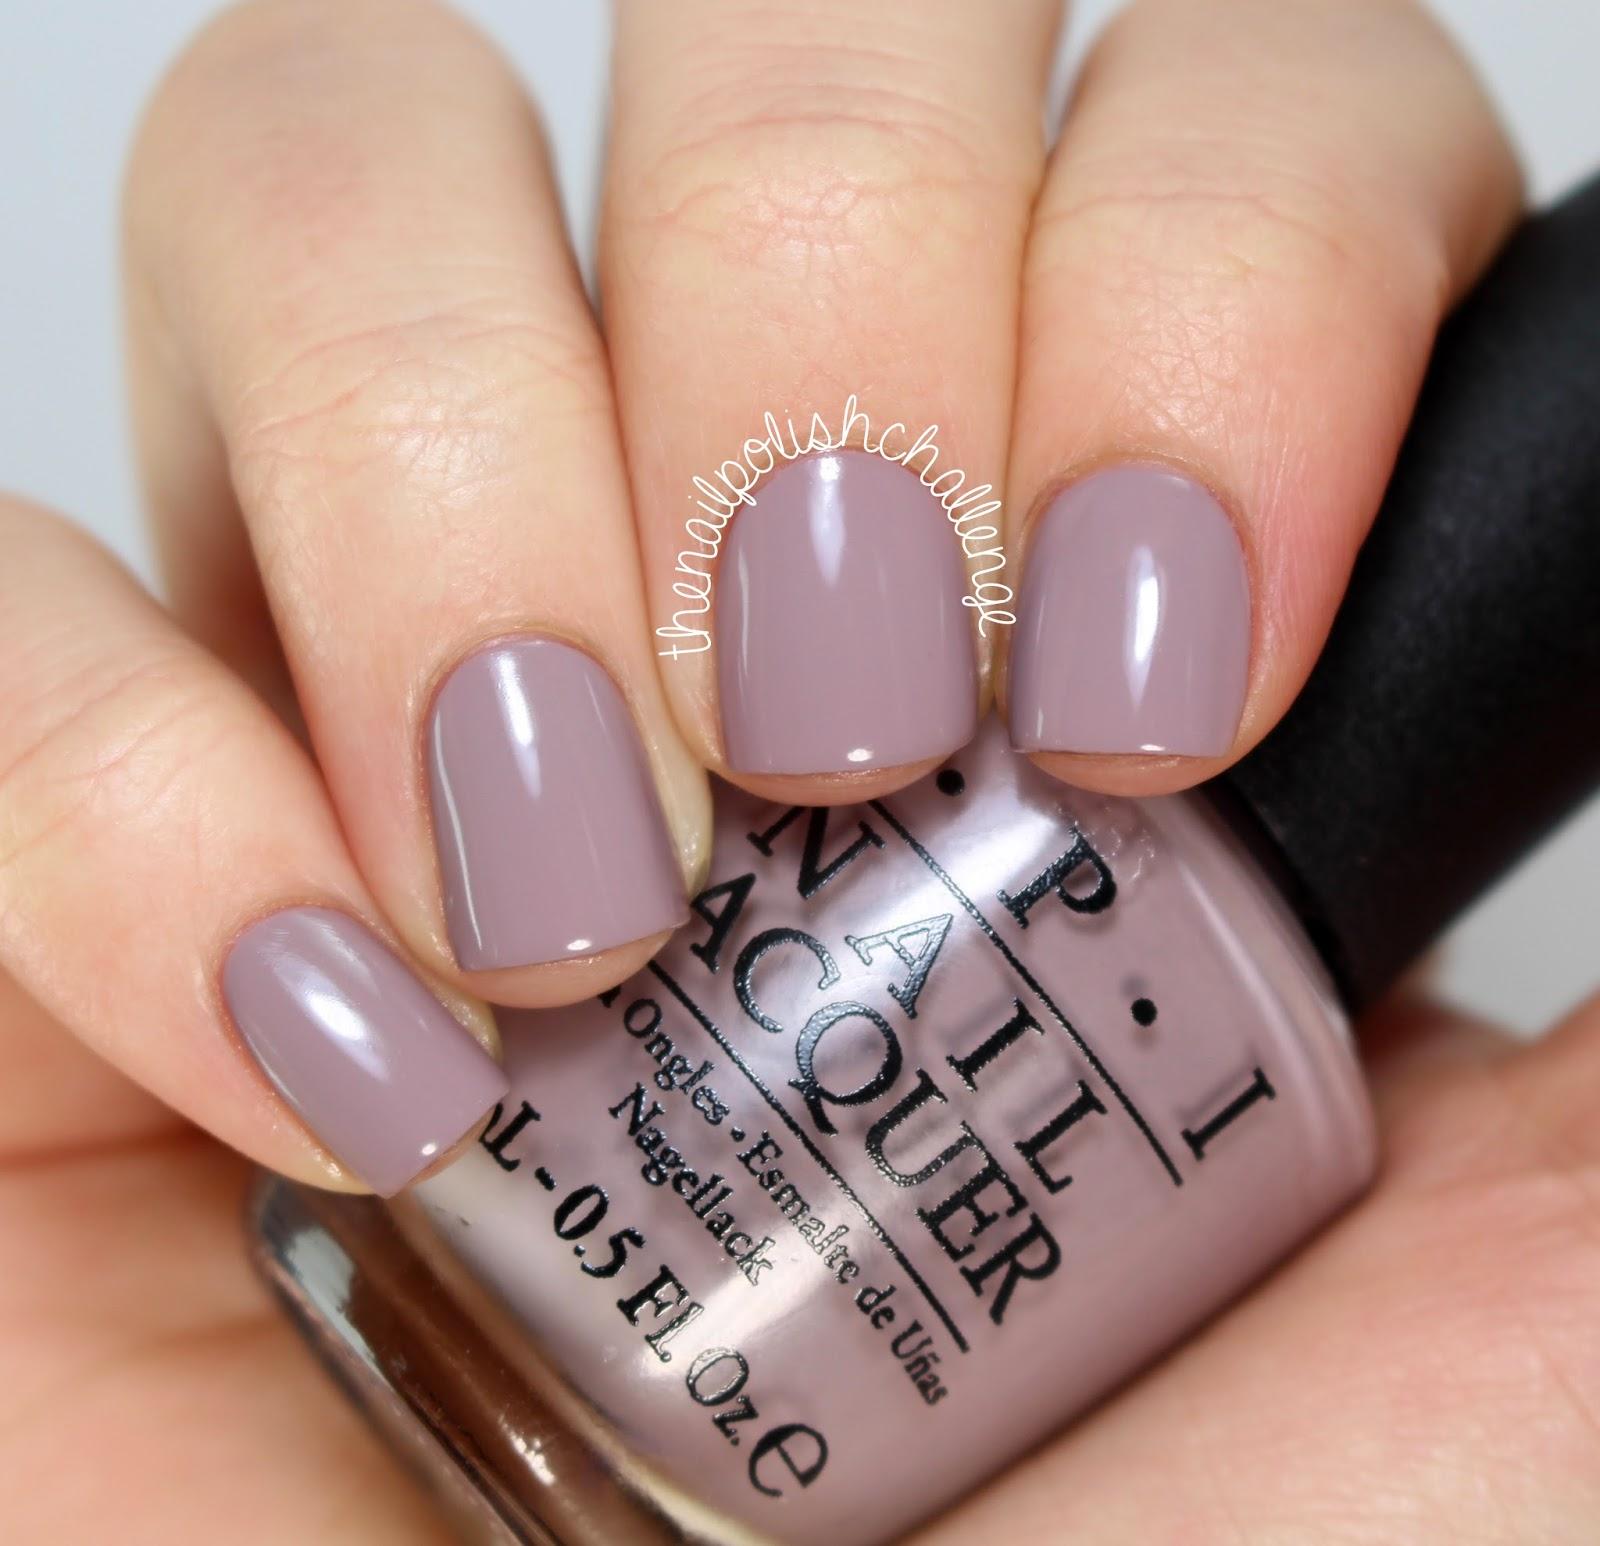 Purple Taupe Nail Polish: Kelli Marissa: HB Beauty Bar: OPI Brazil 2014 Collection